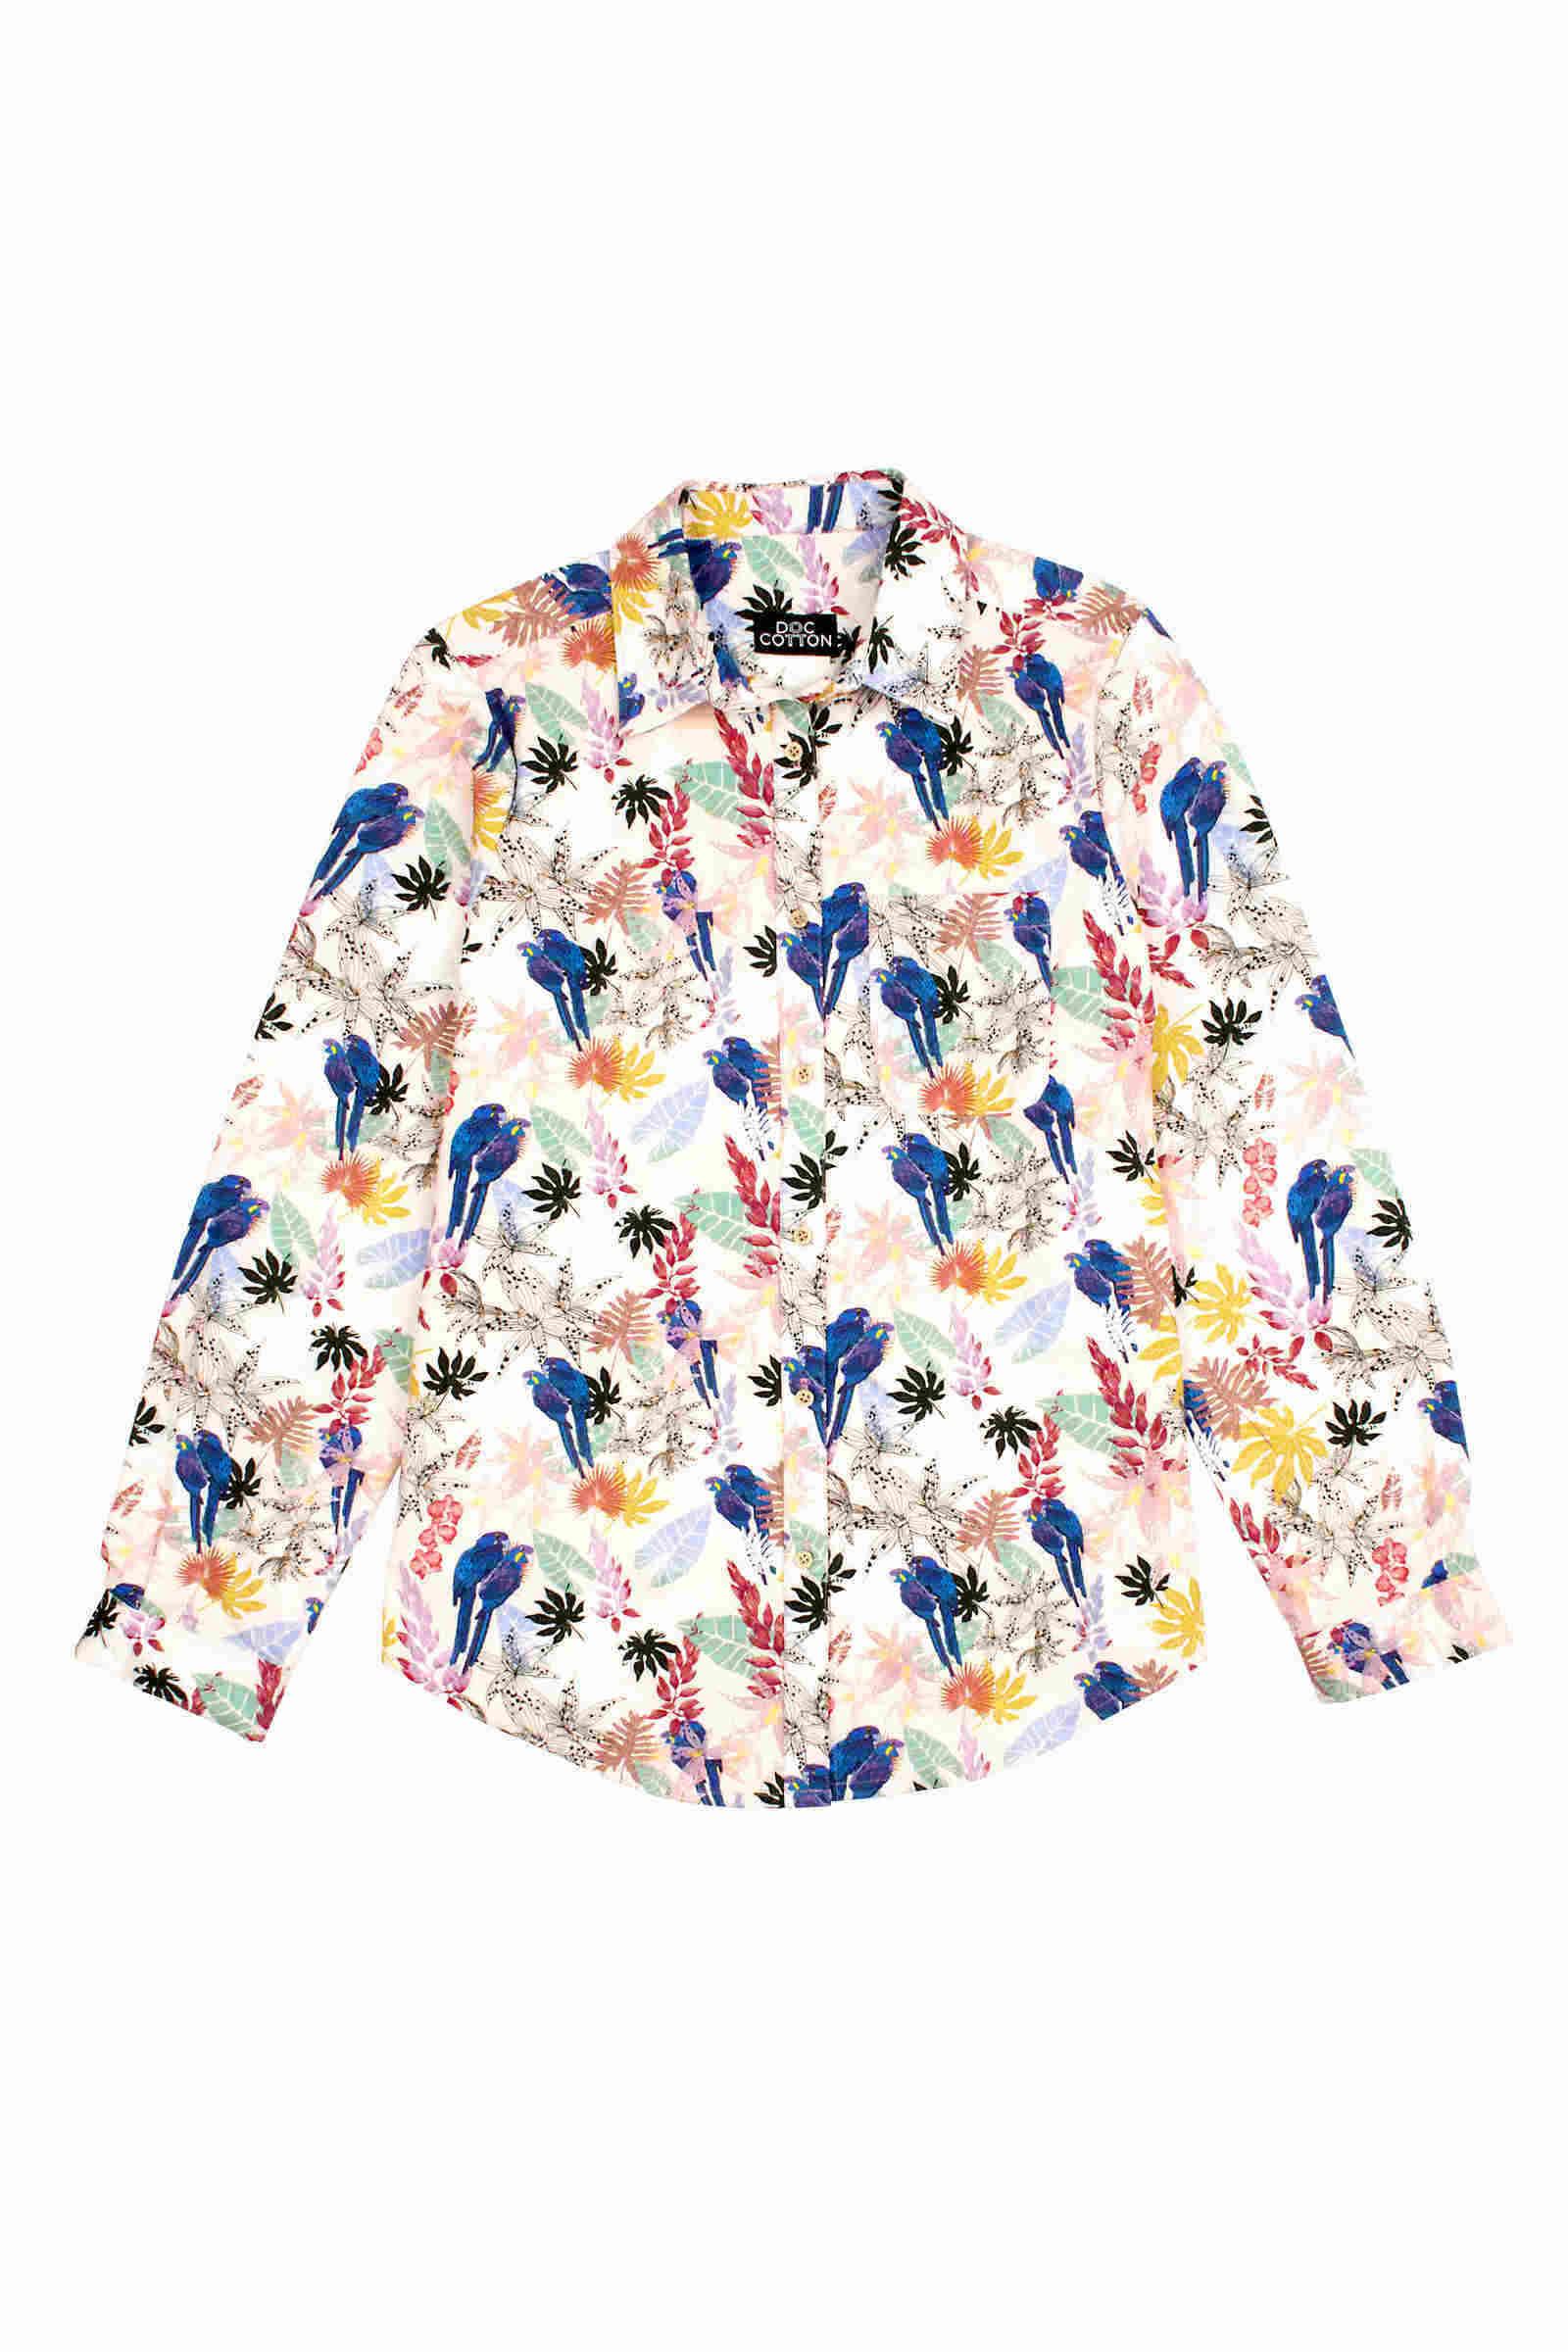 Women's boyfriend shirt